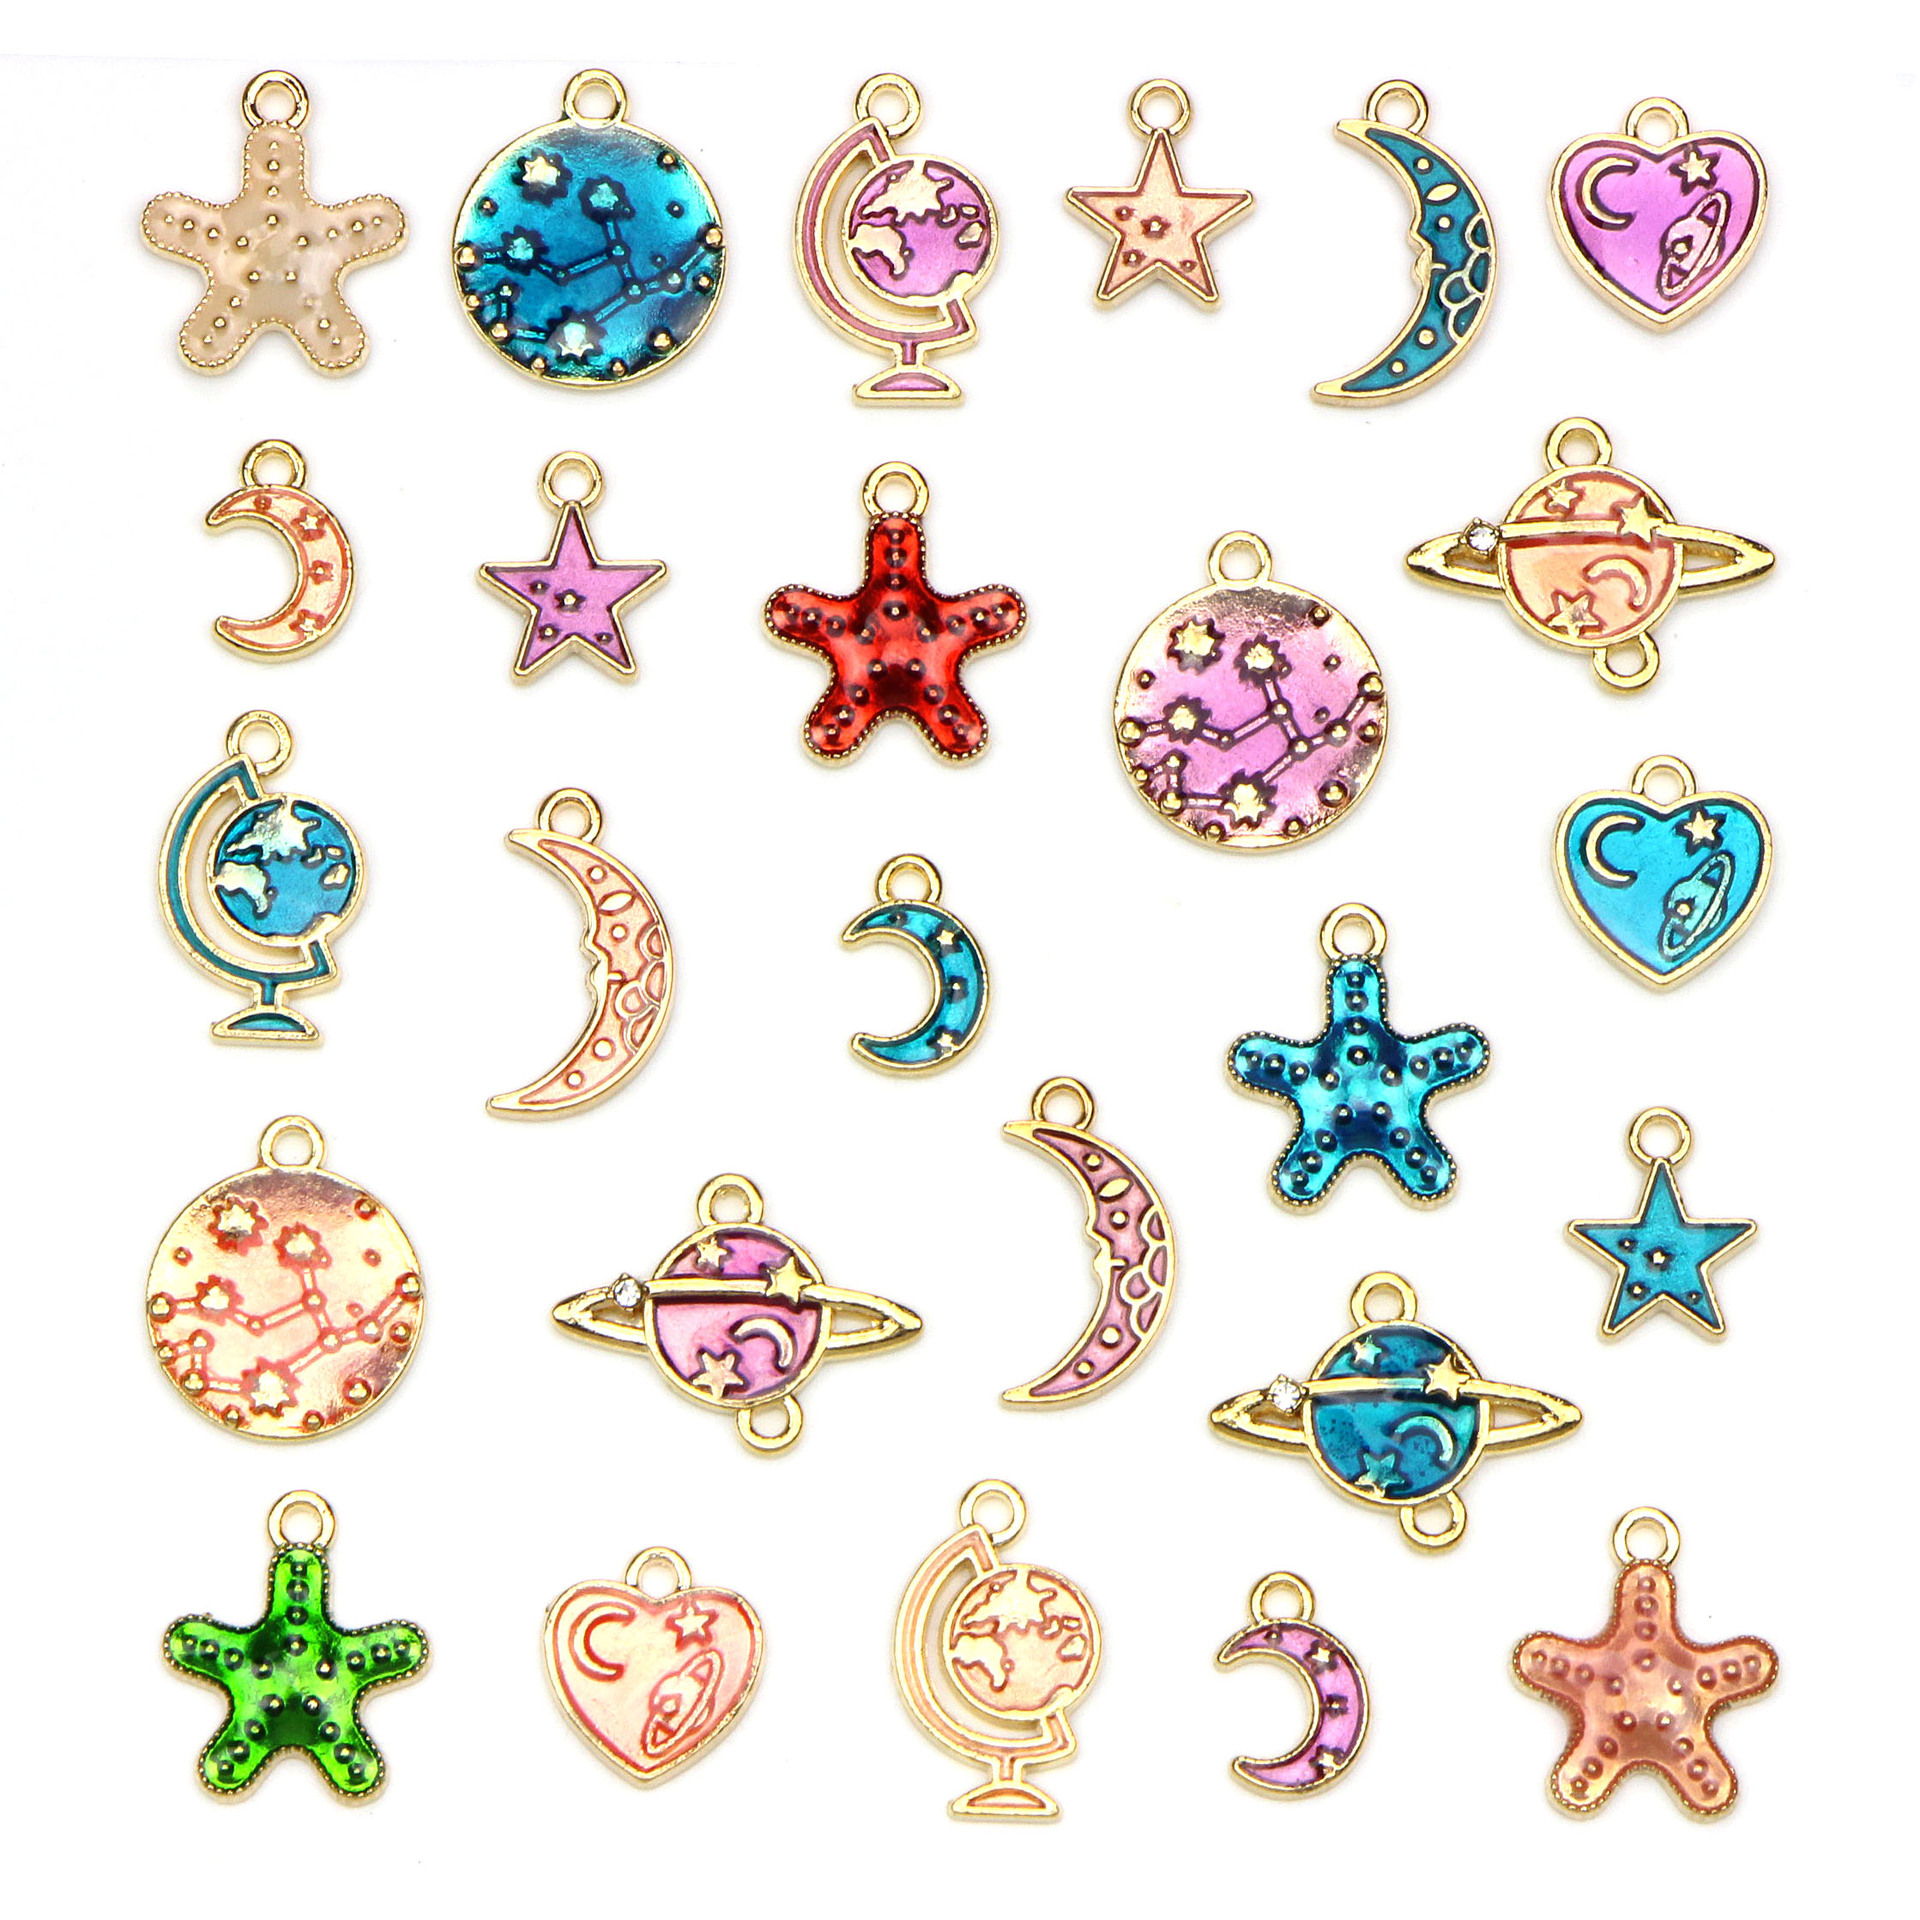 1Set Stars Moon Pendant Jewelry DIY Making Handmade Accessories Pendant Jewelry*